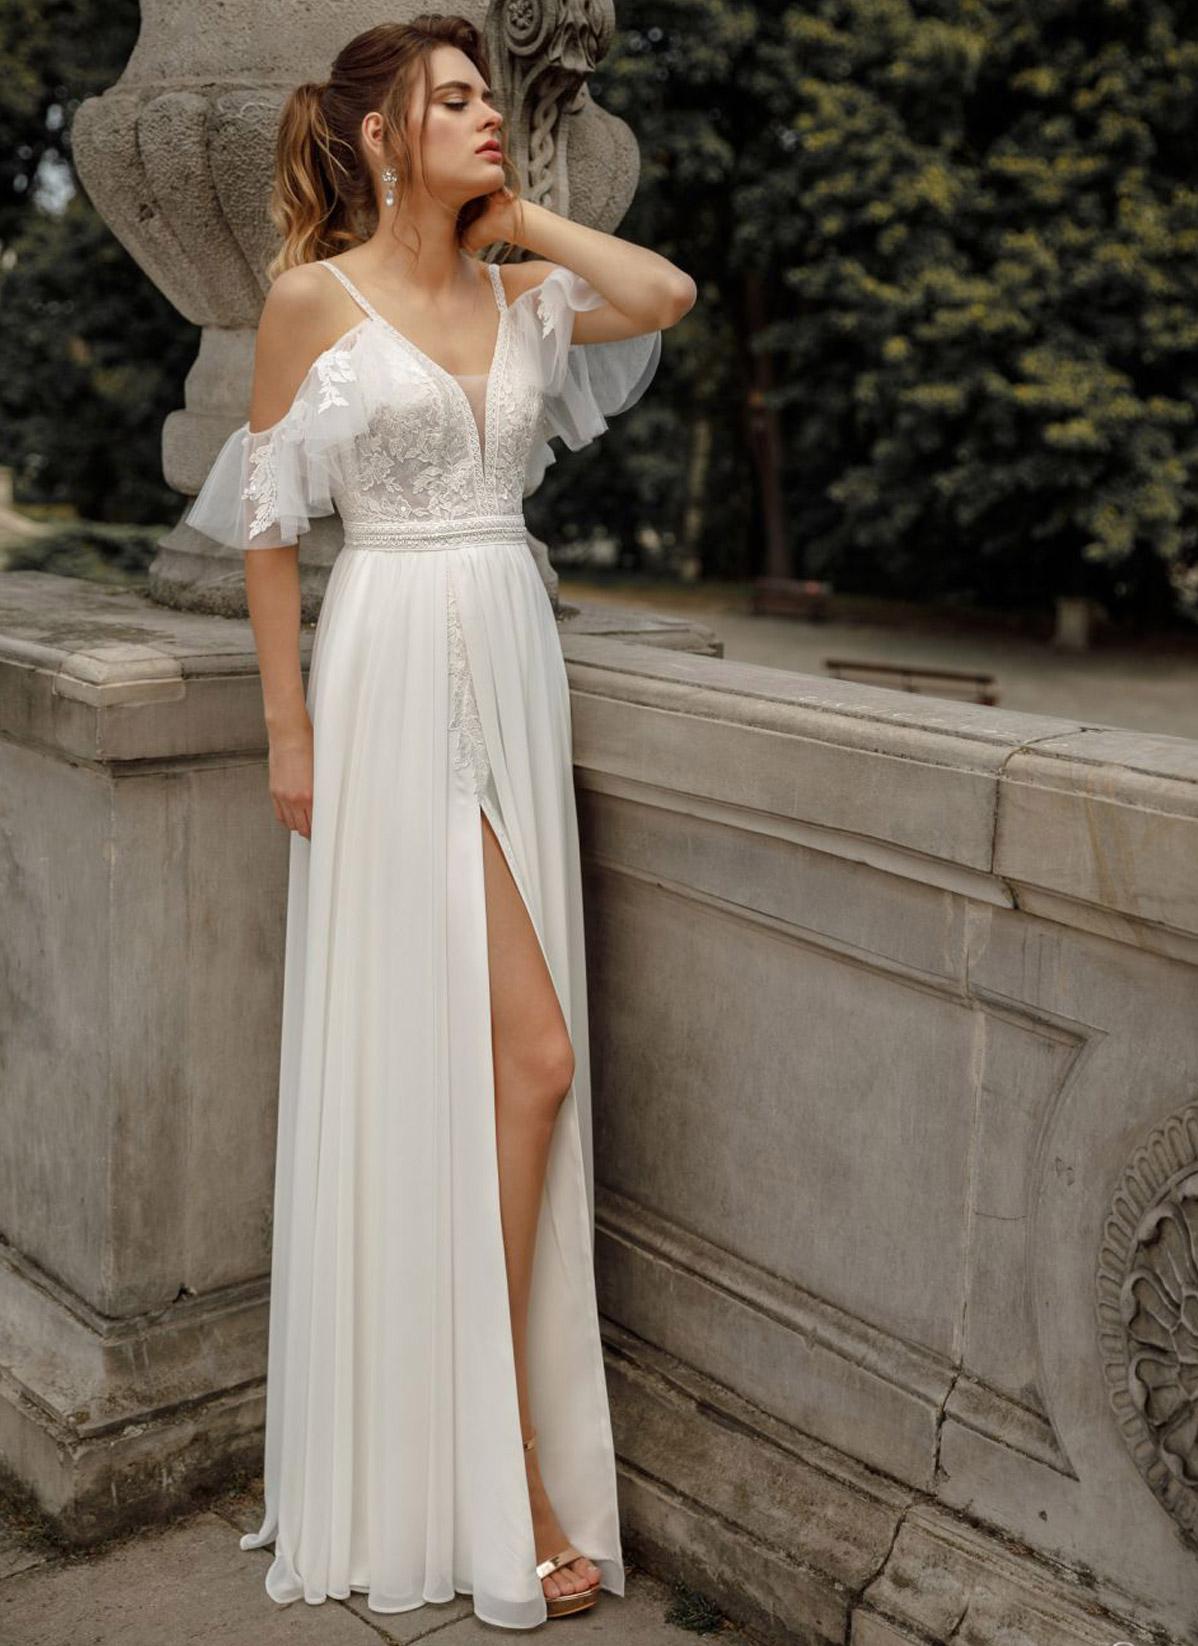 Herm&#8217;s Bridal <br> Cusco